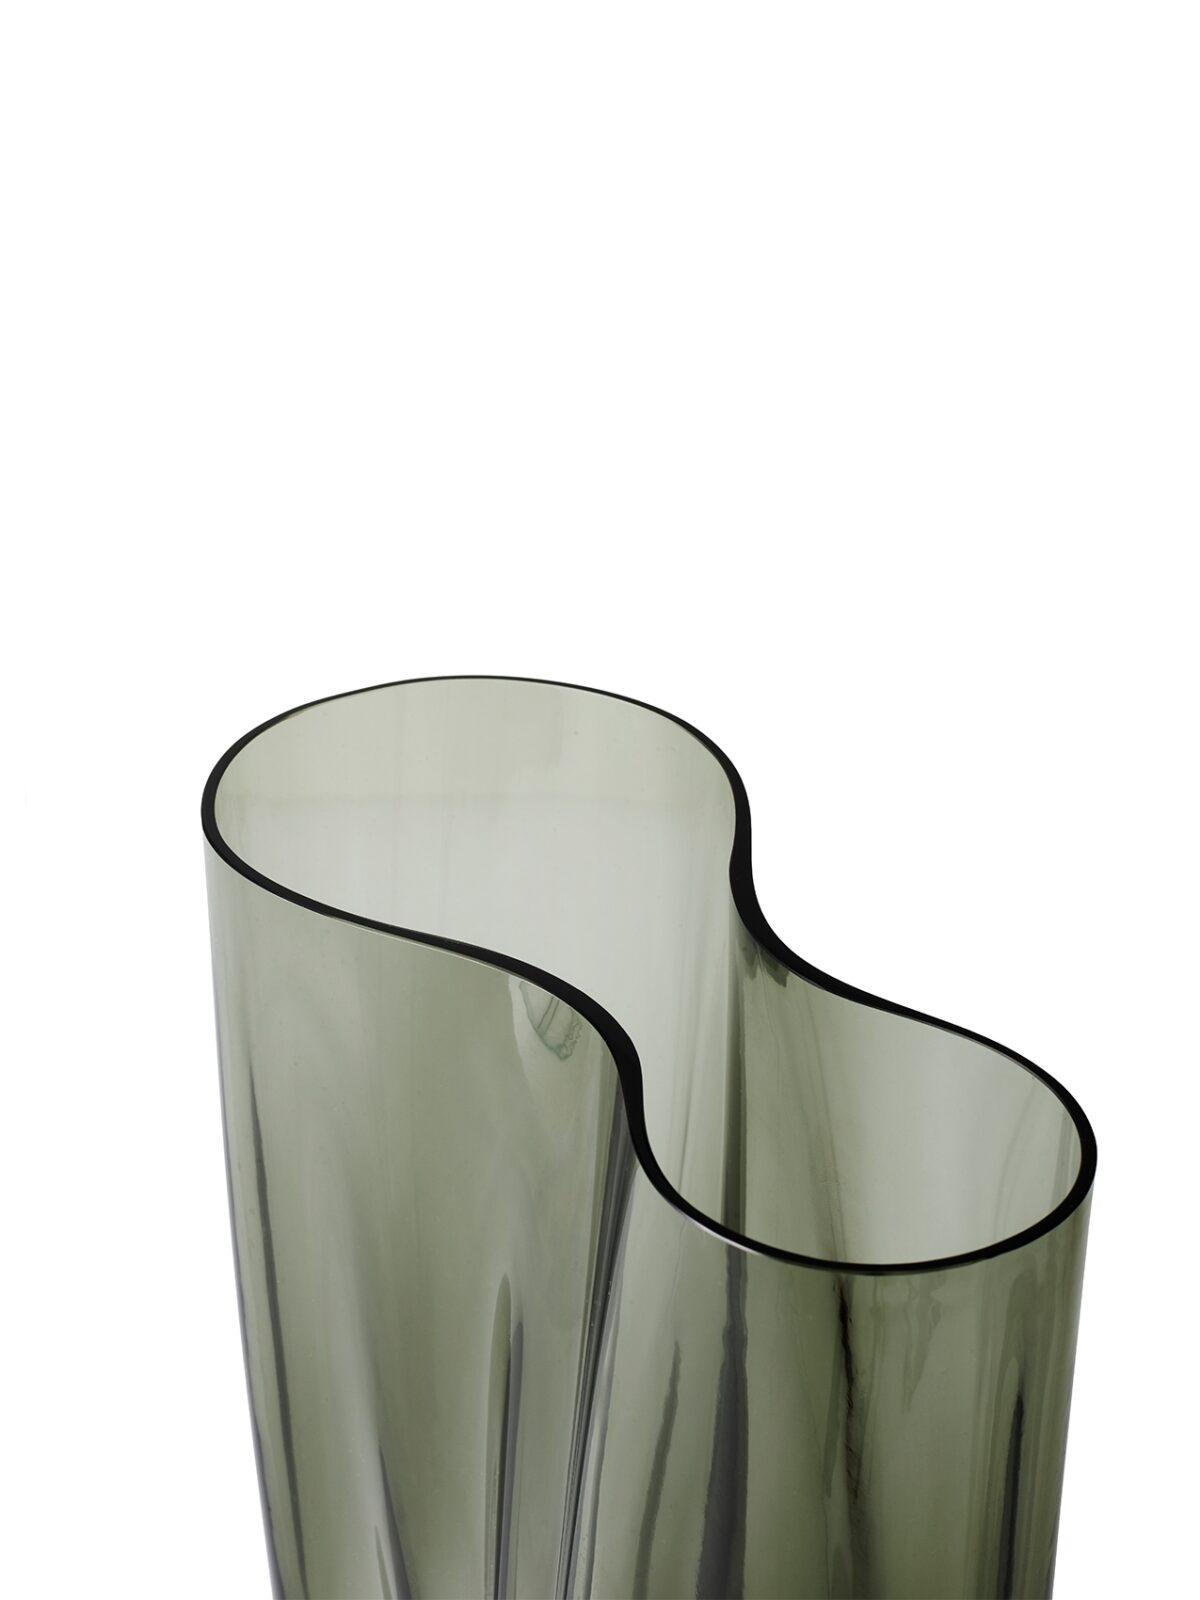 4736949 Aer Vase Small 33 01 2 1